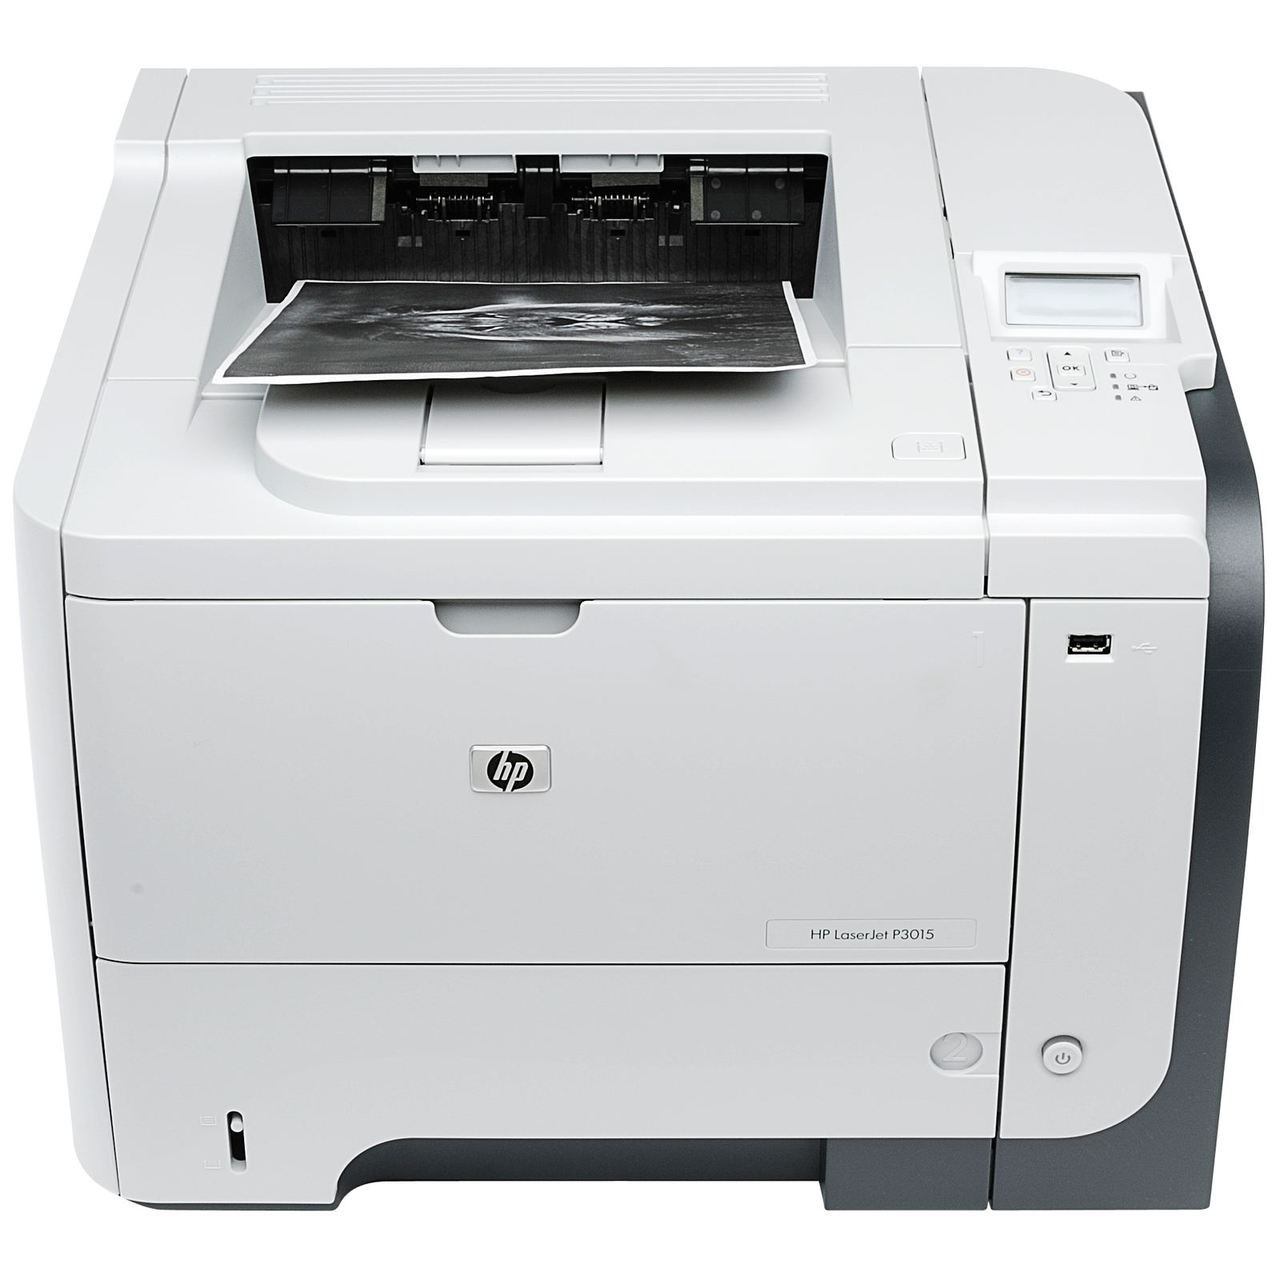 HP LaserJet P3015dn - CE528A - HP Laser Printer for sale